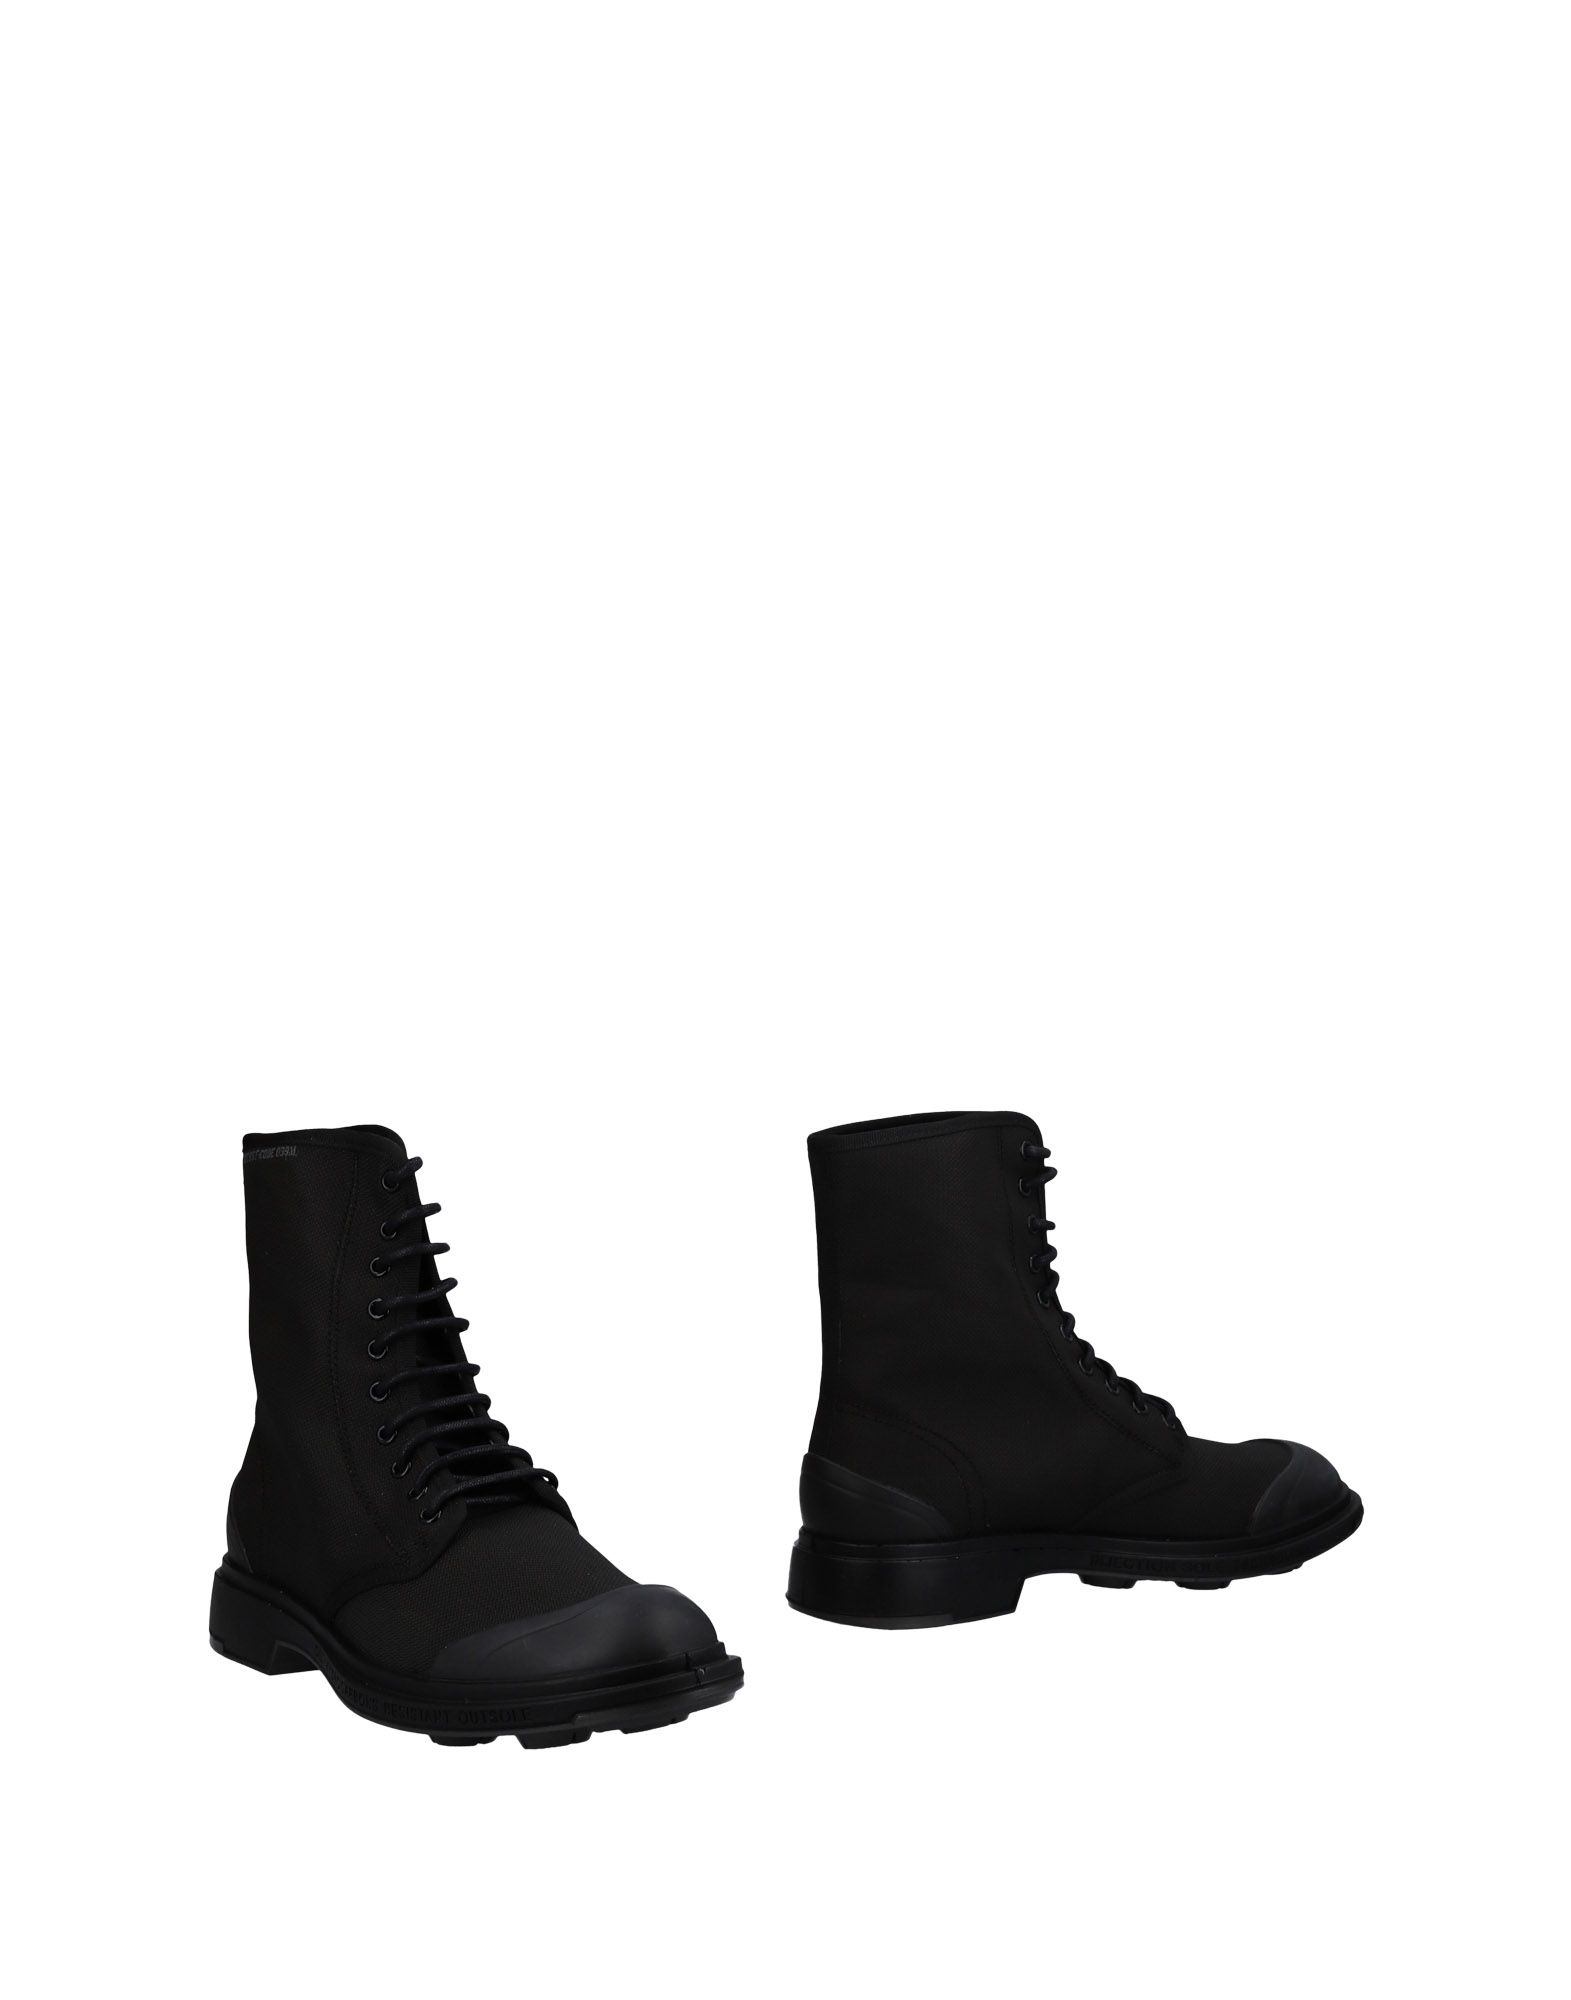 Rabatt echte Schuhe Pezzol   1951 Stiefelette Herren  Pezzol 11484387TM 1734ac